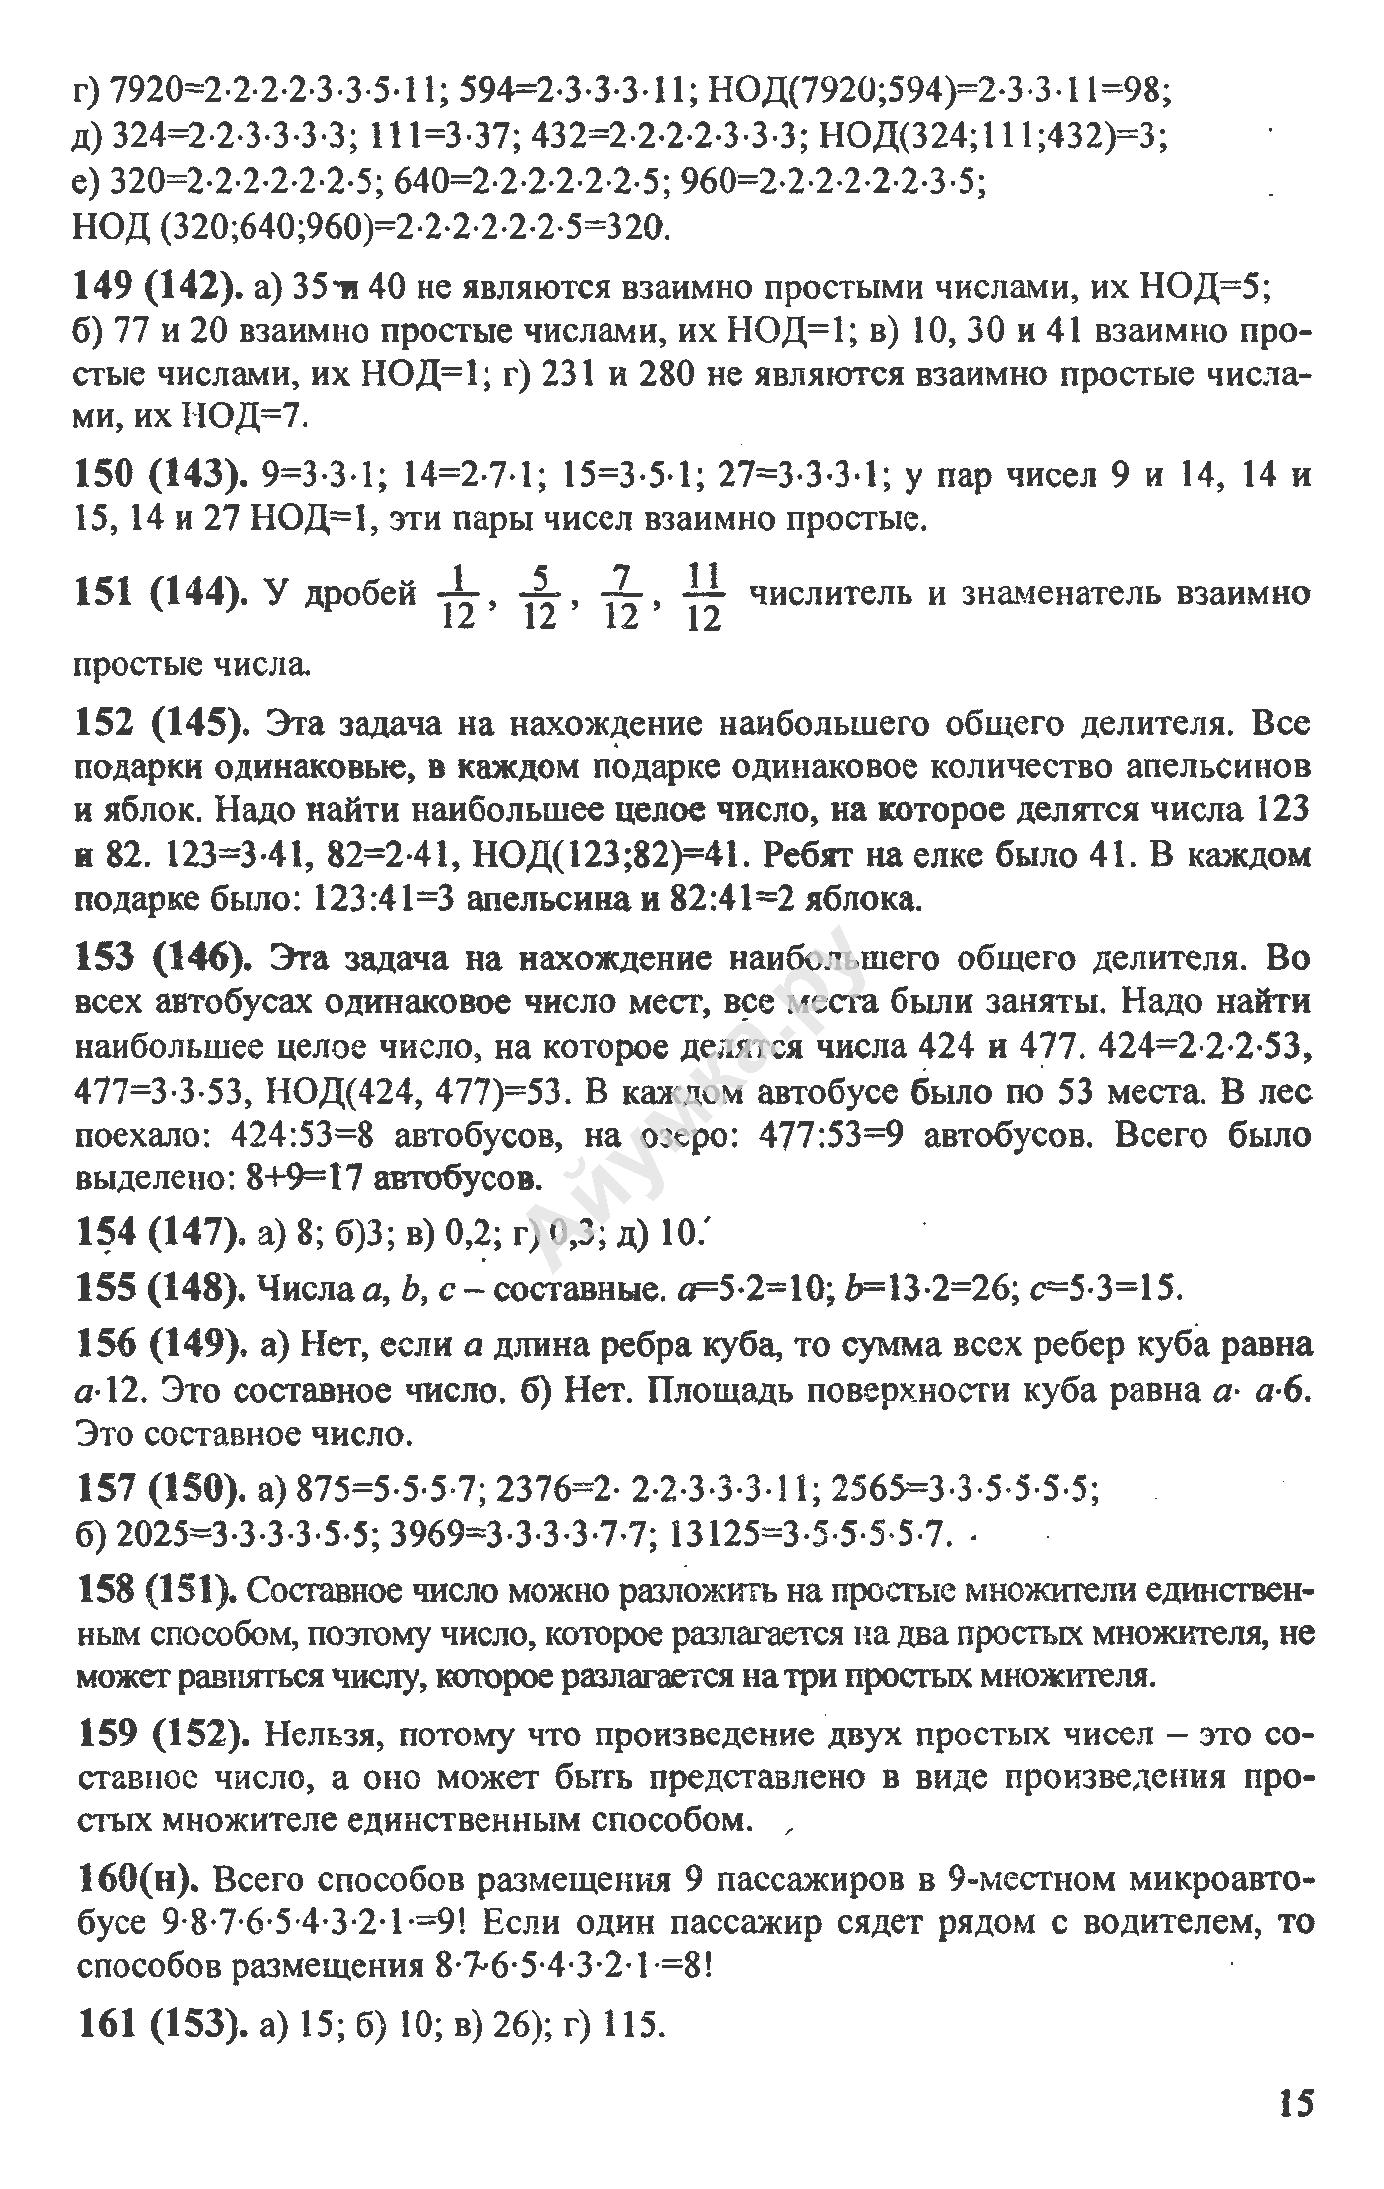 Иванова экономика 10-11 класс fb